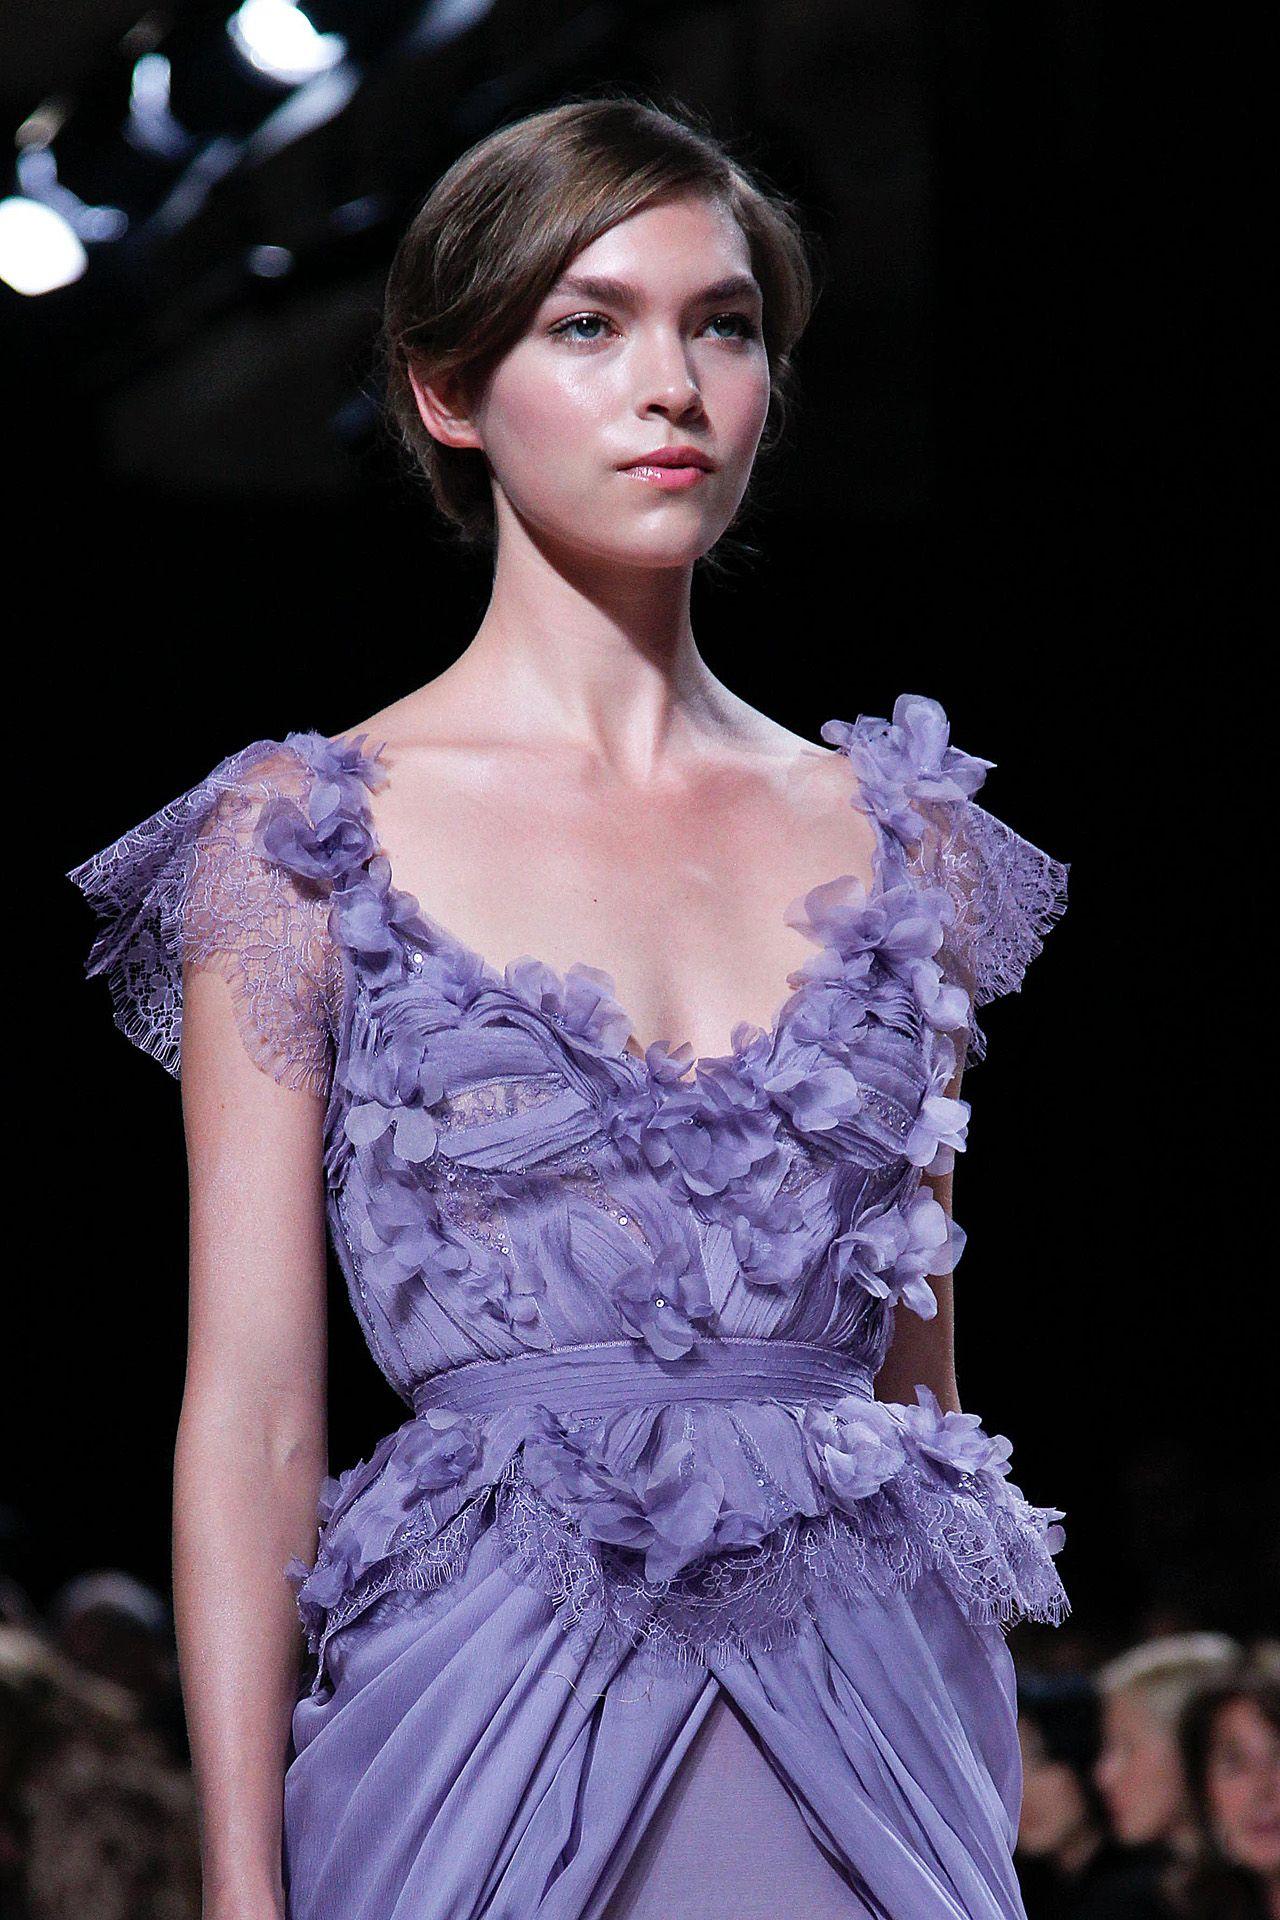 Elie Saab Spring/Summer 2011 Haute Couture